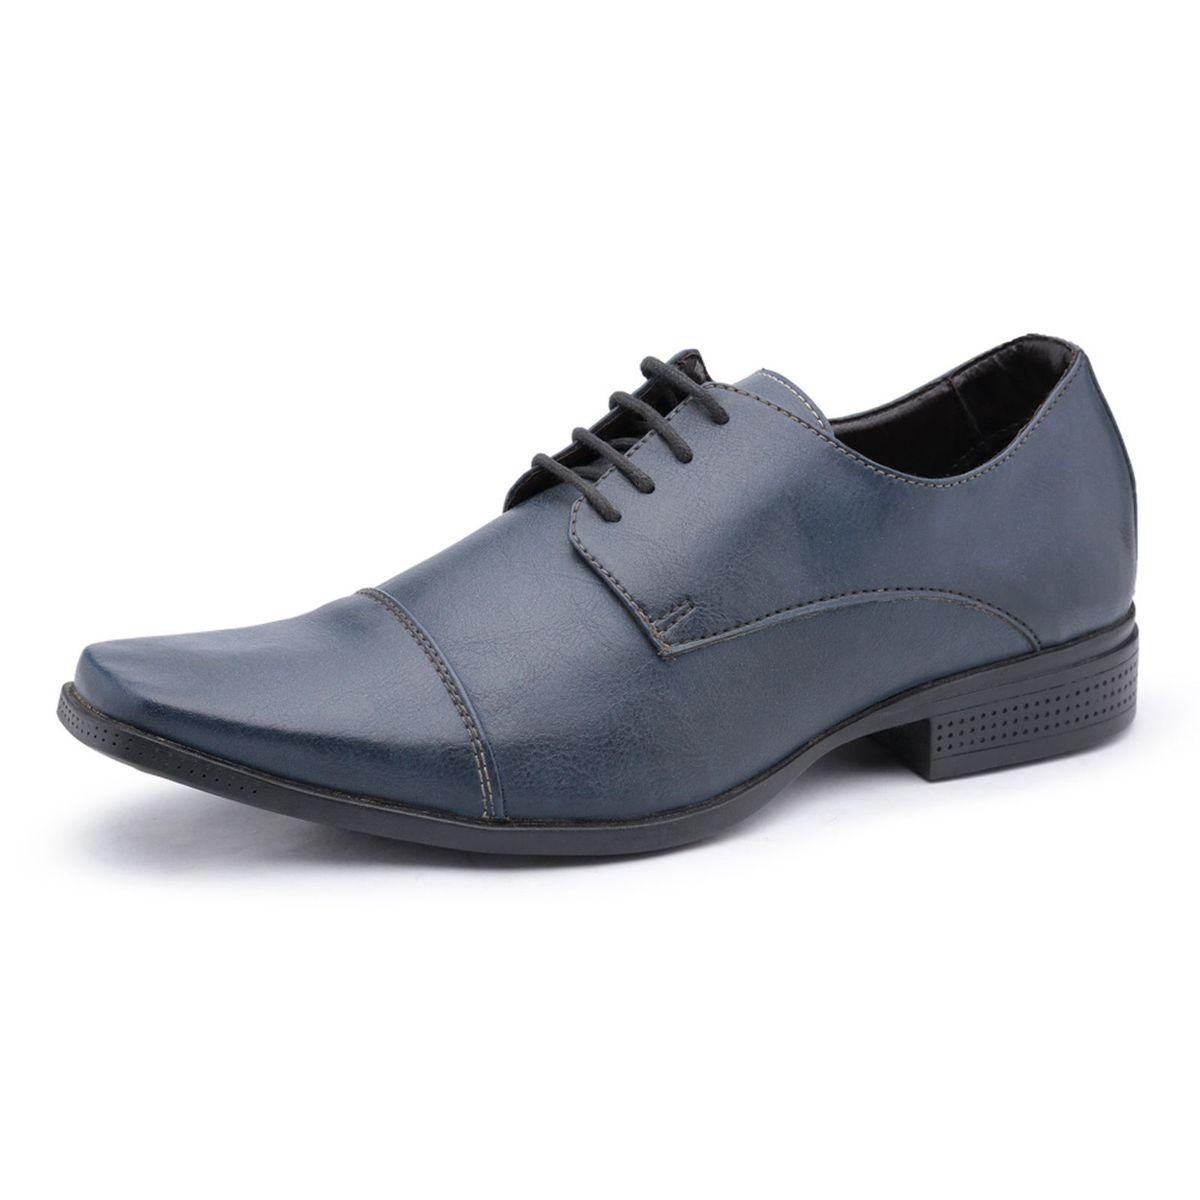 975a8a9c8 Sapato Social Masculino Ruggero em Couro Ecológico Azul   Sapato Masculino  Ruggero Nunca Usado 27817316   enjoei